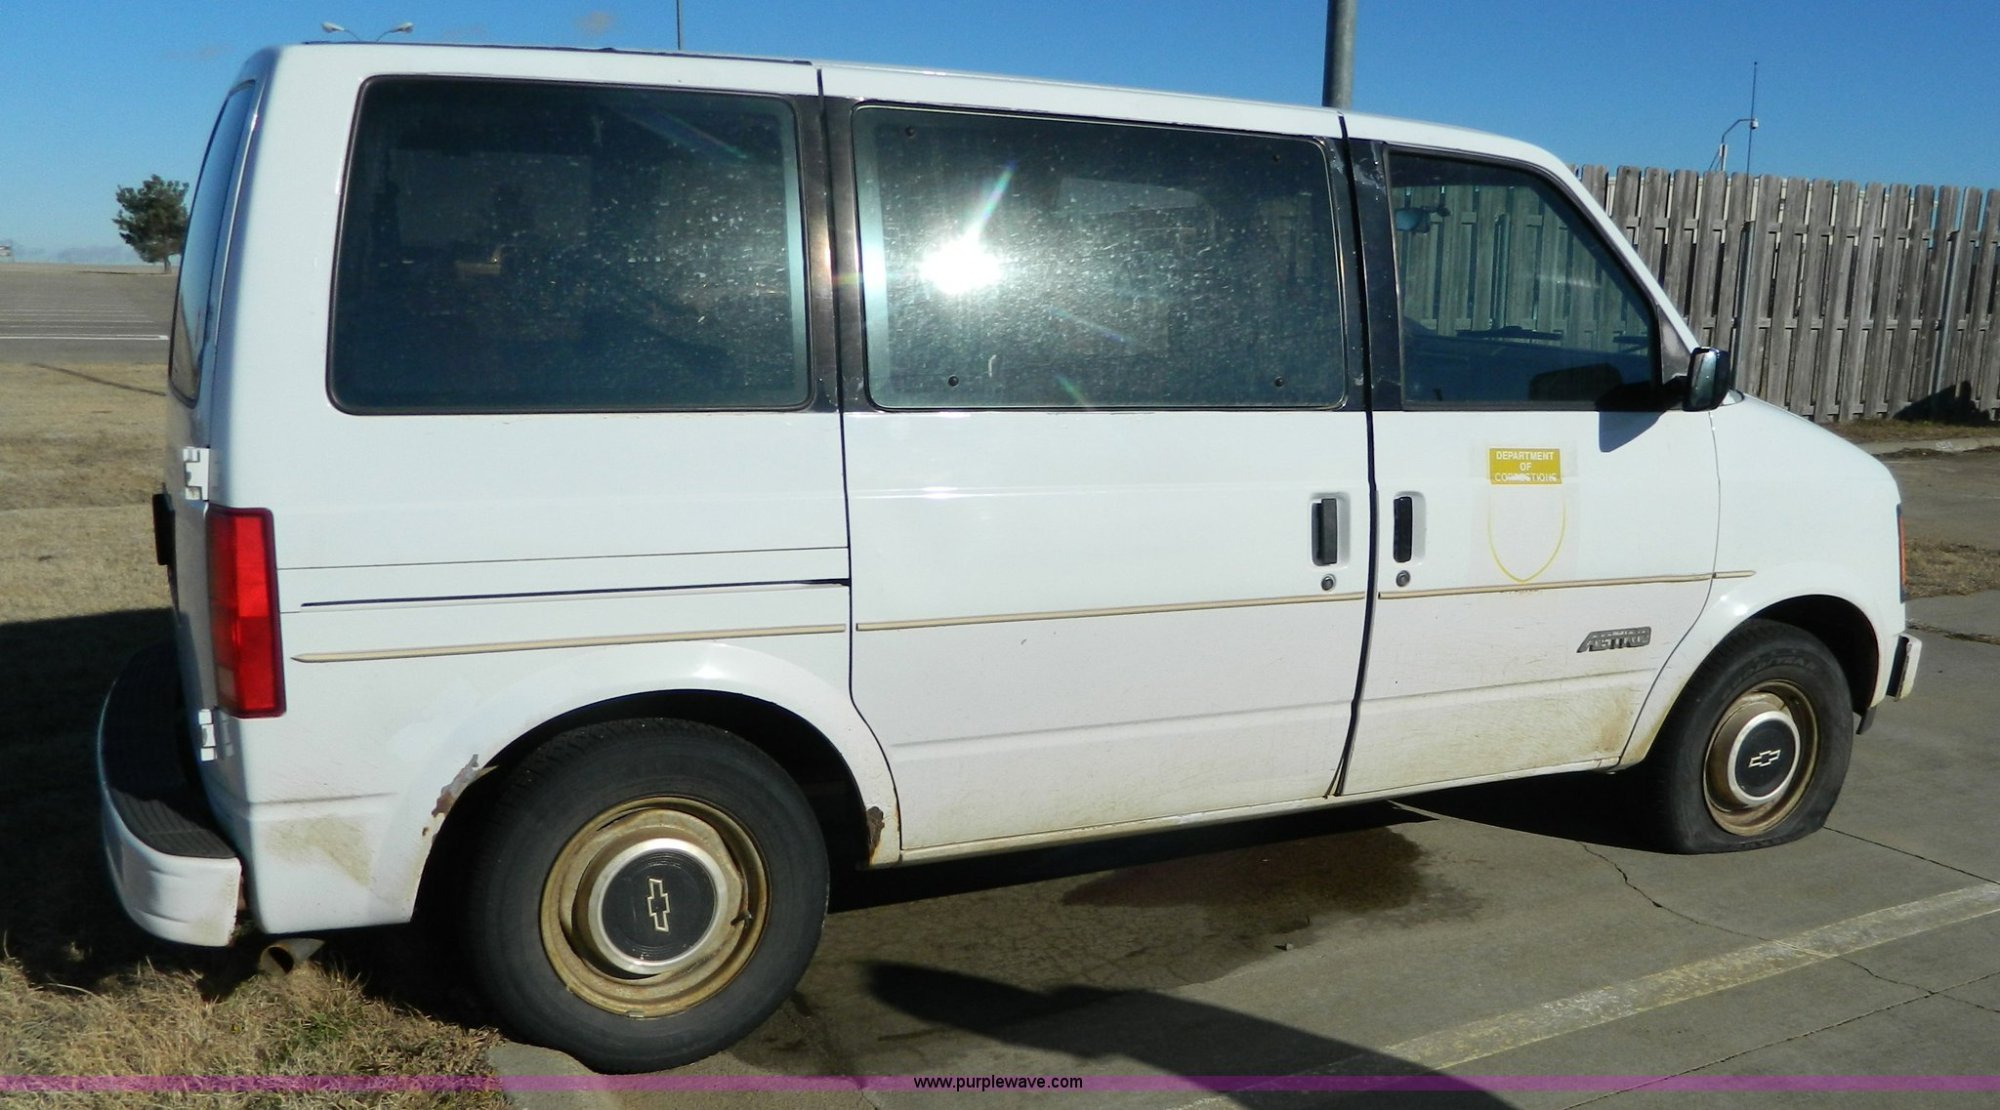 hight resolution of  1991 chevrolet astro van full size in new window